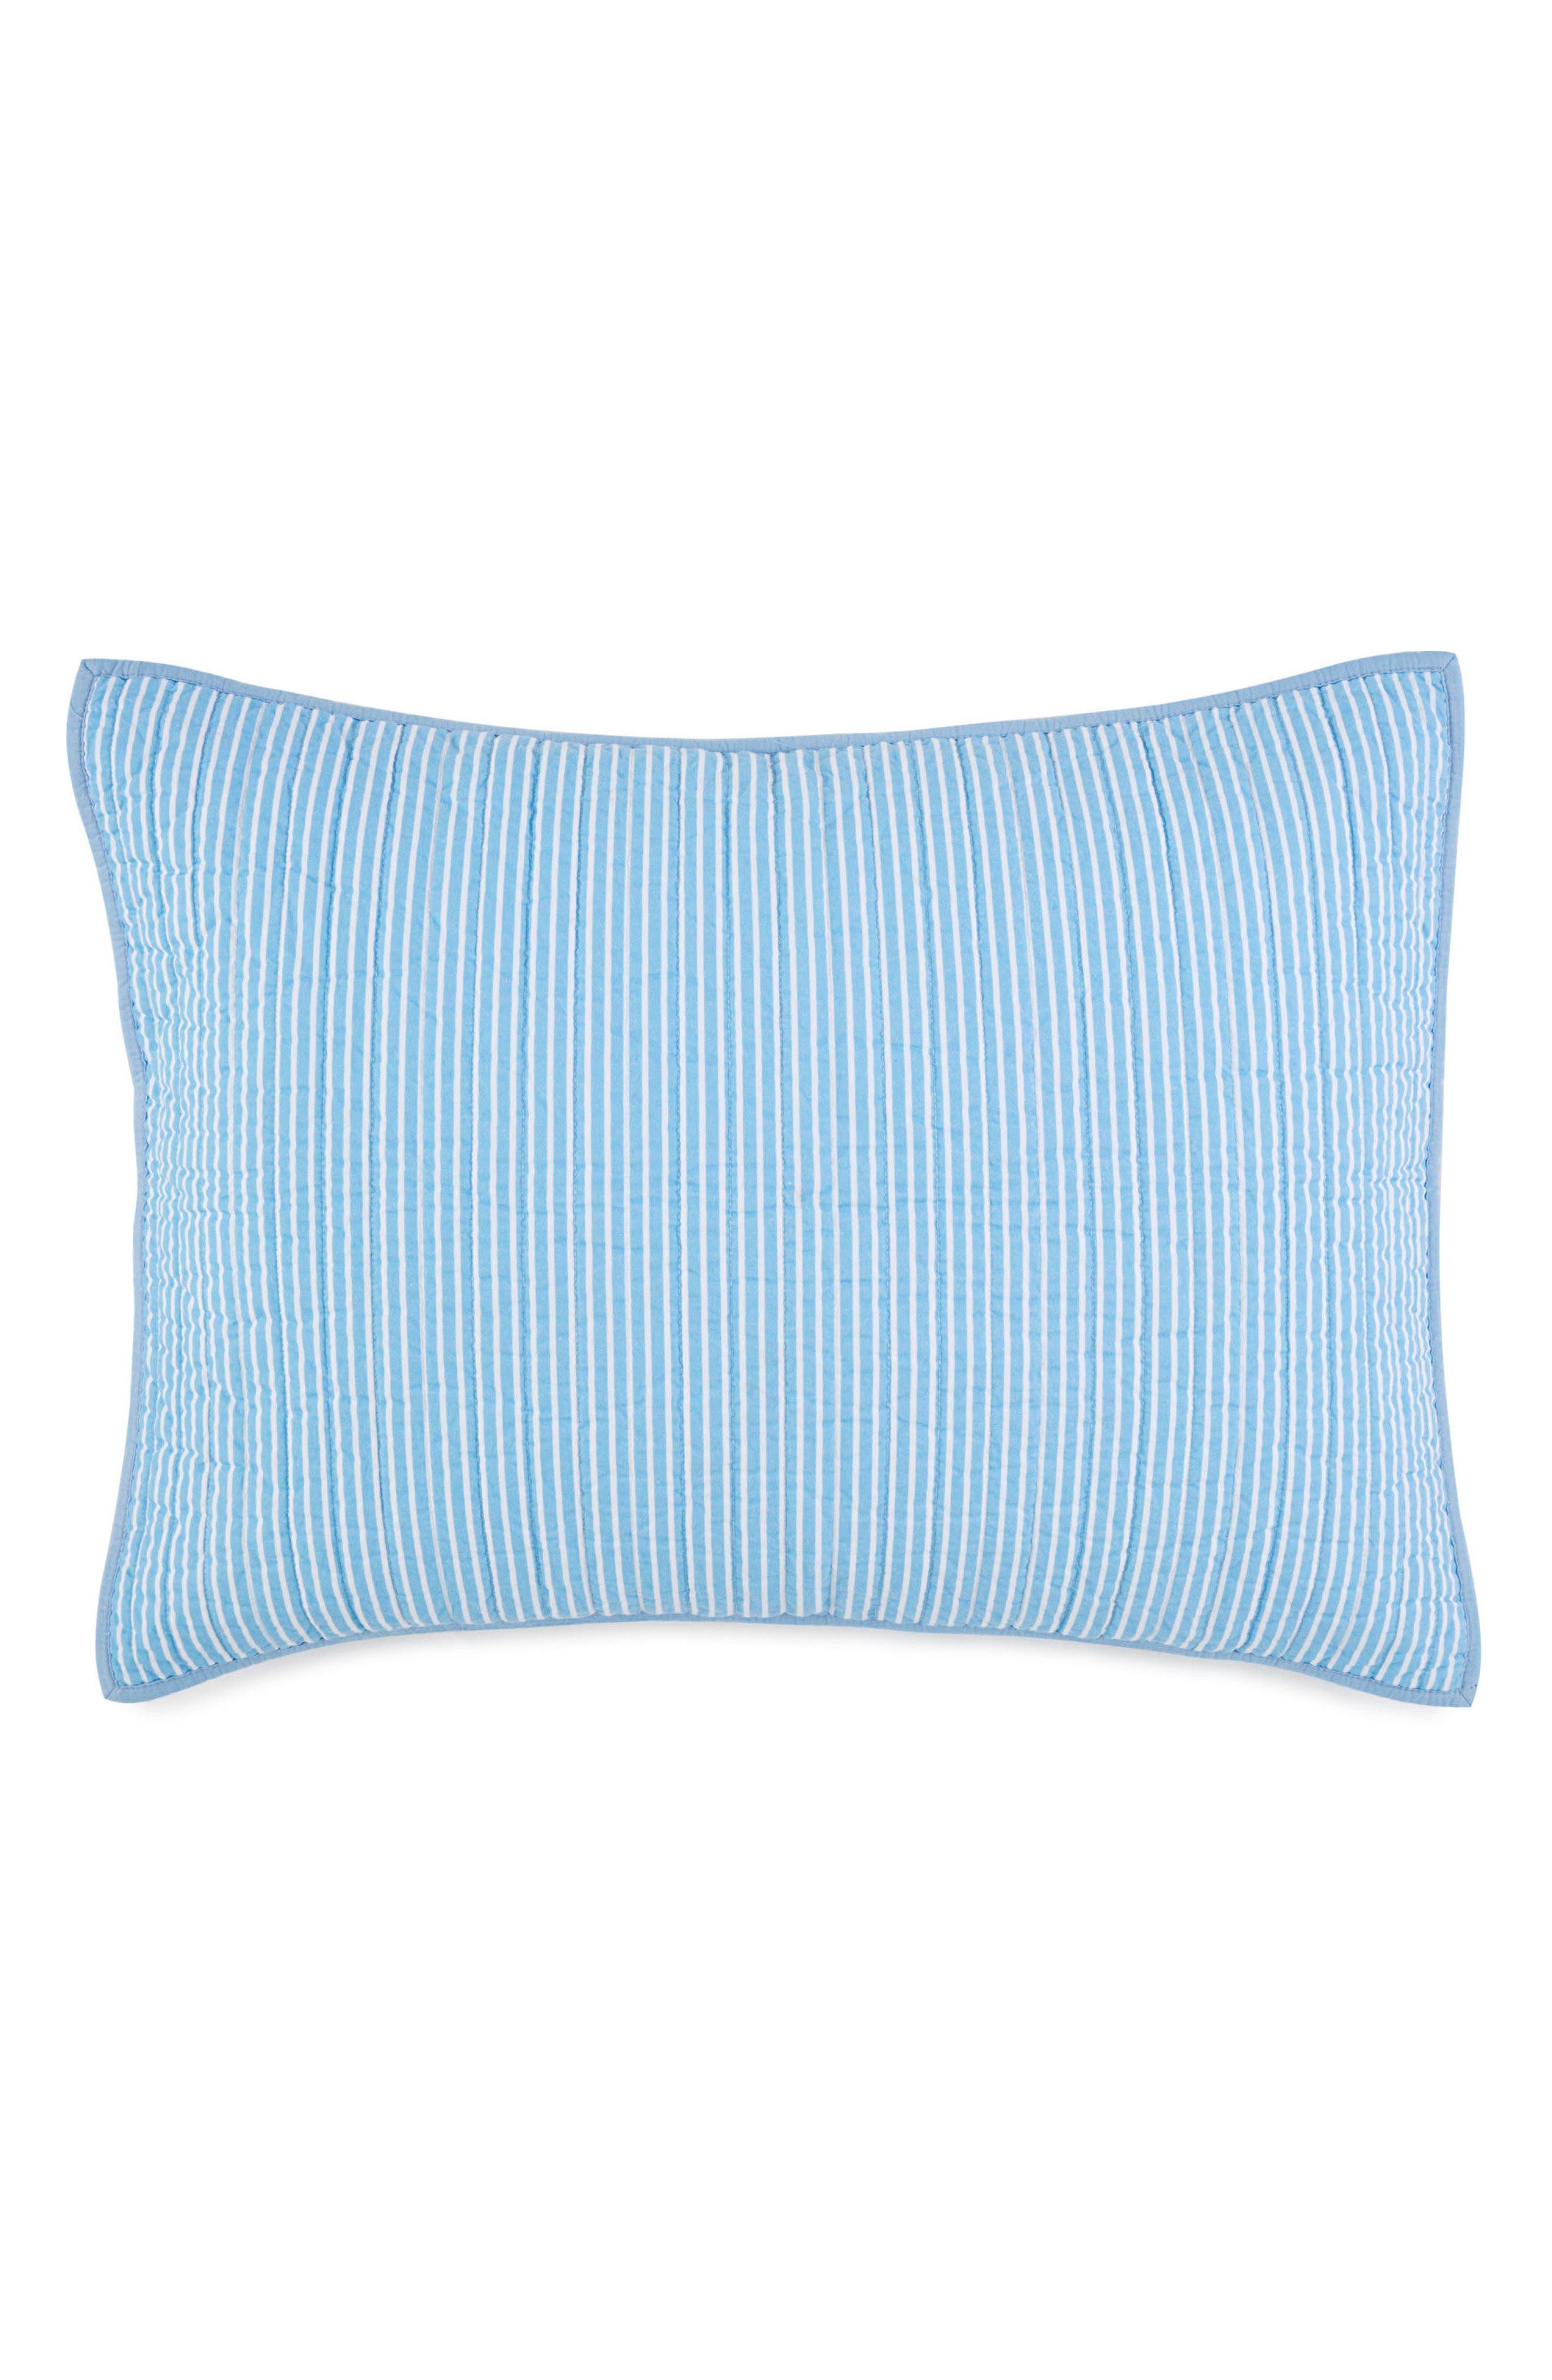 Sail Stripe Sham,                         Main,                         color, Blue Multi